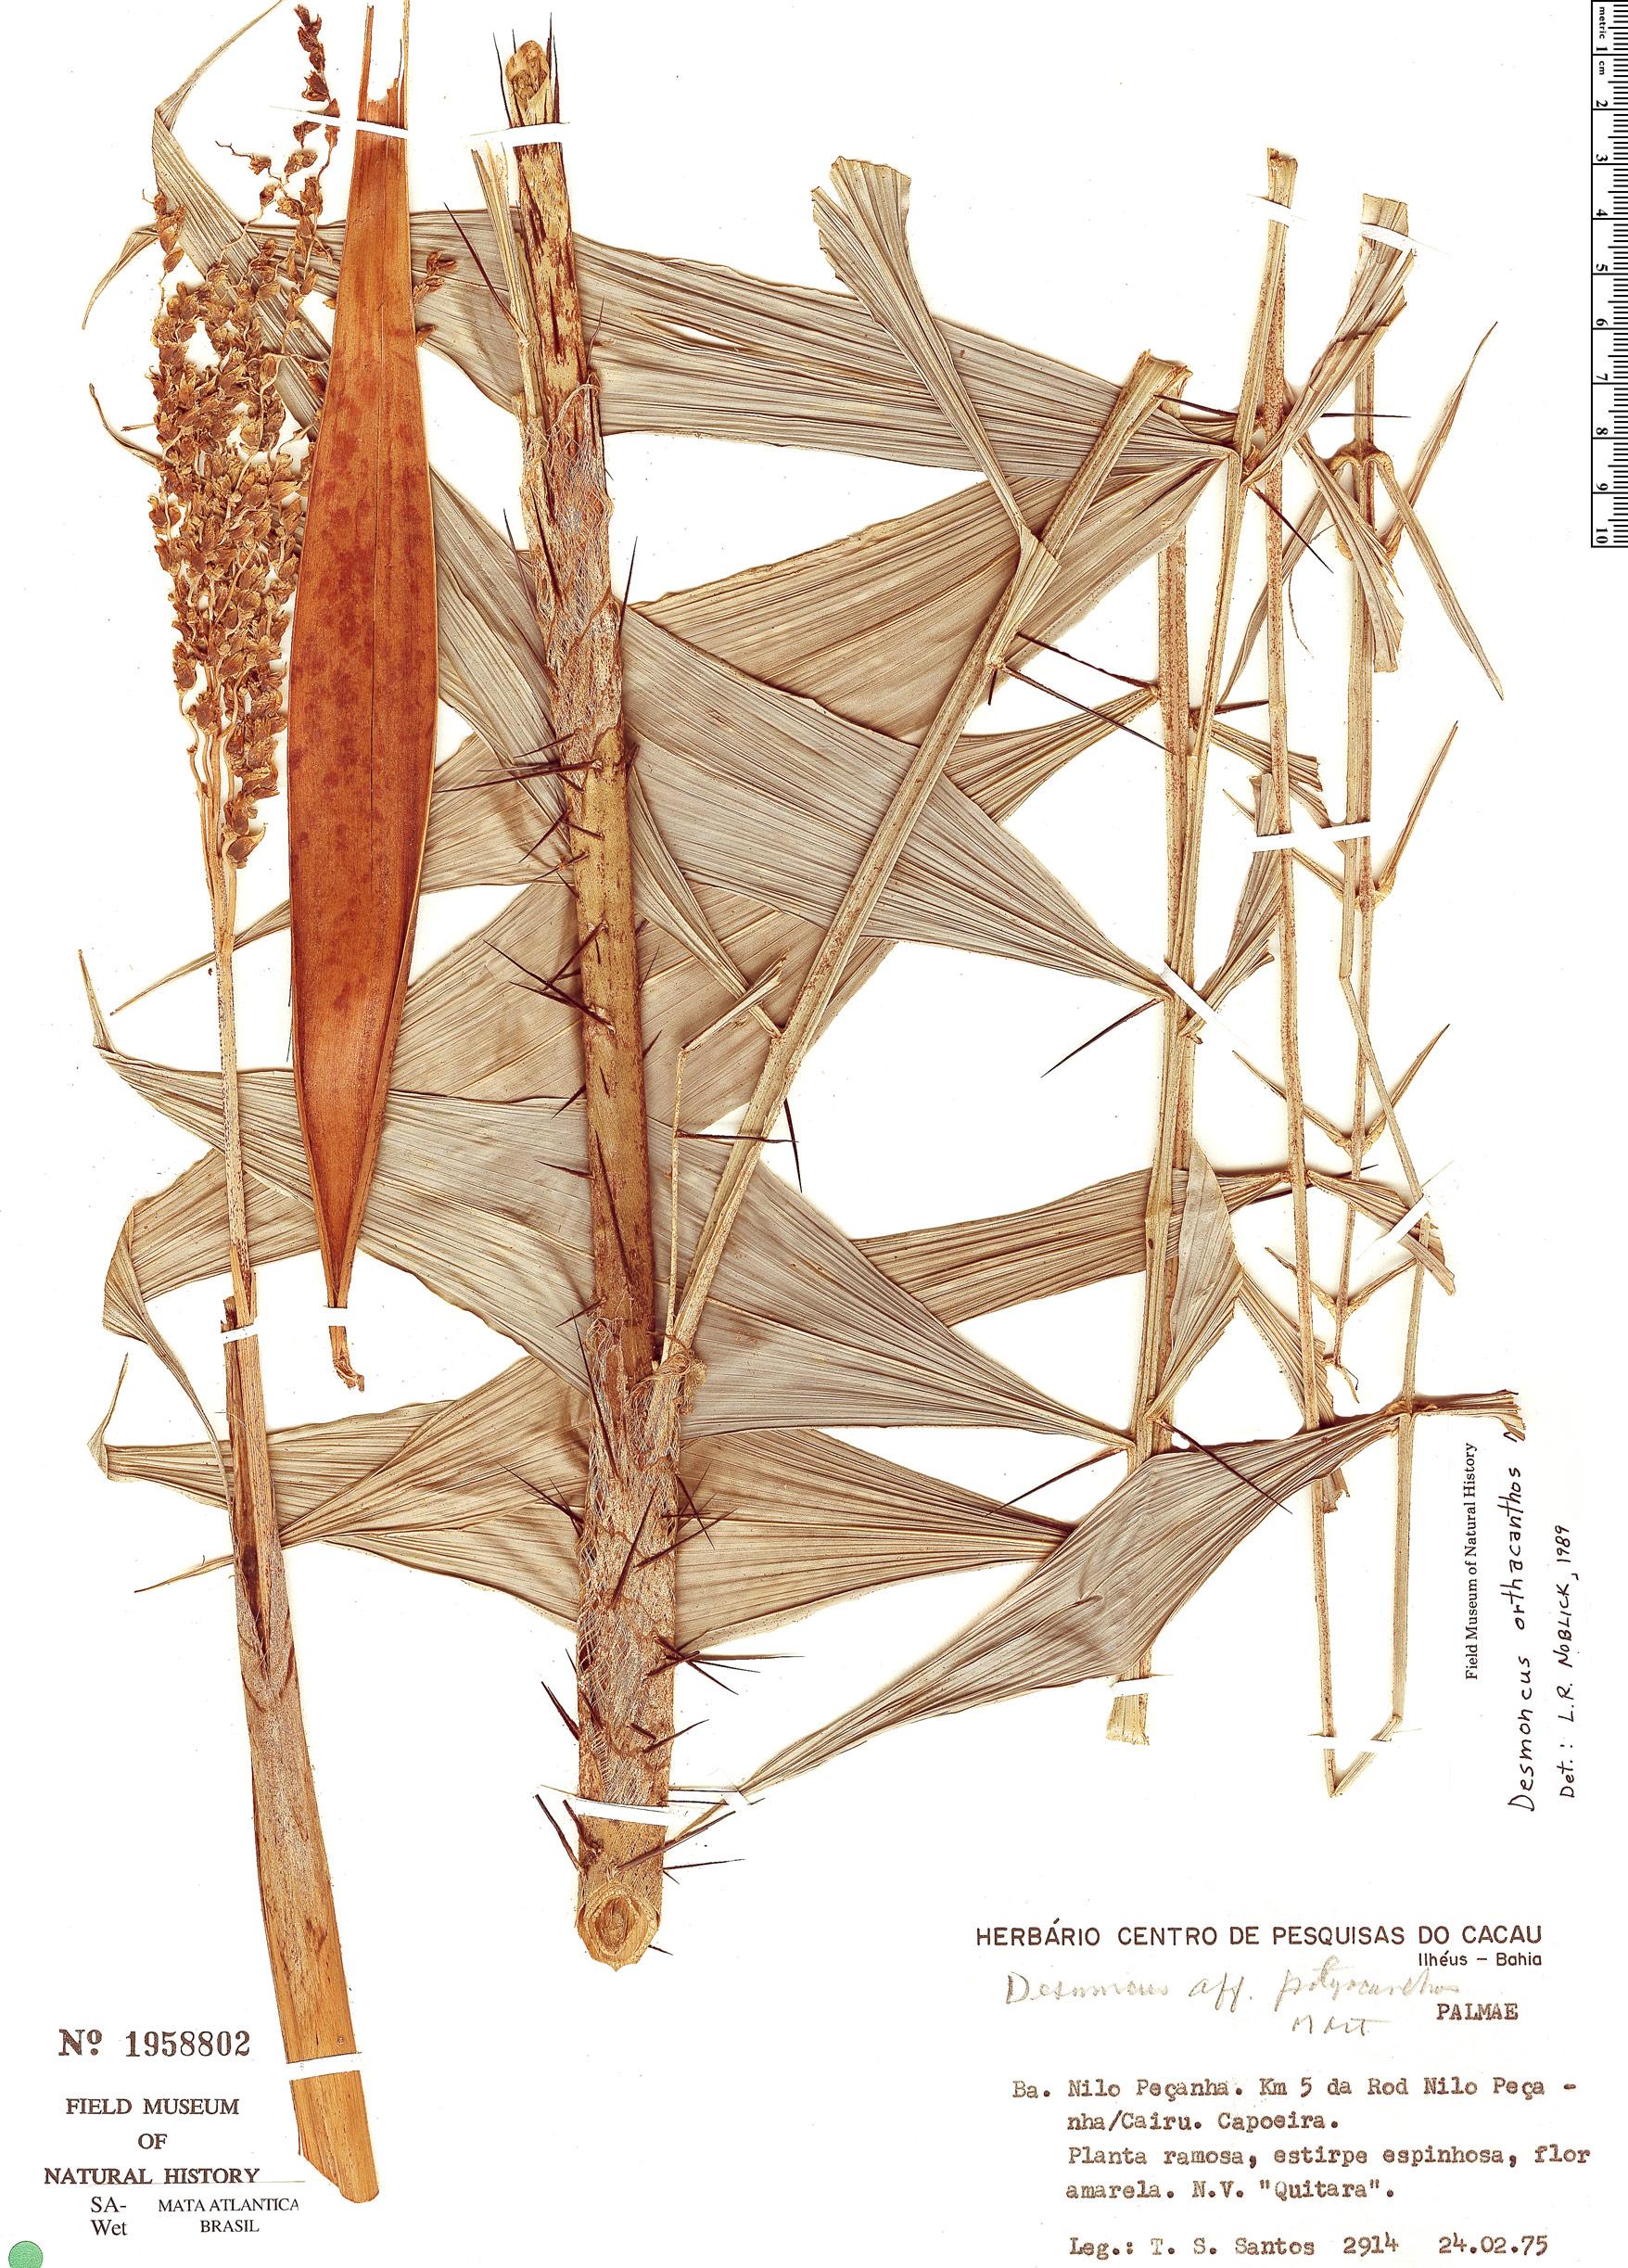 Espécime: Desmoncus orthacanthos